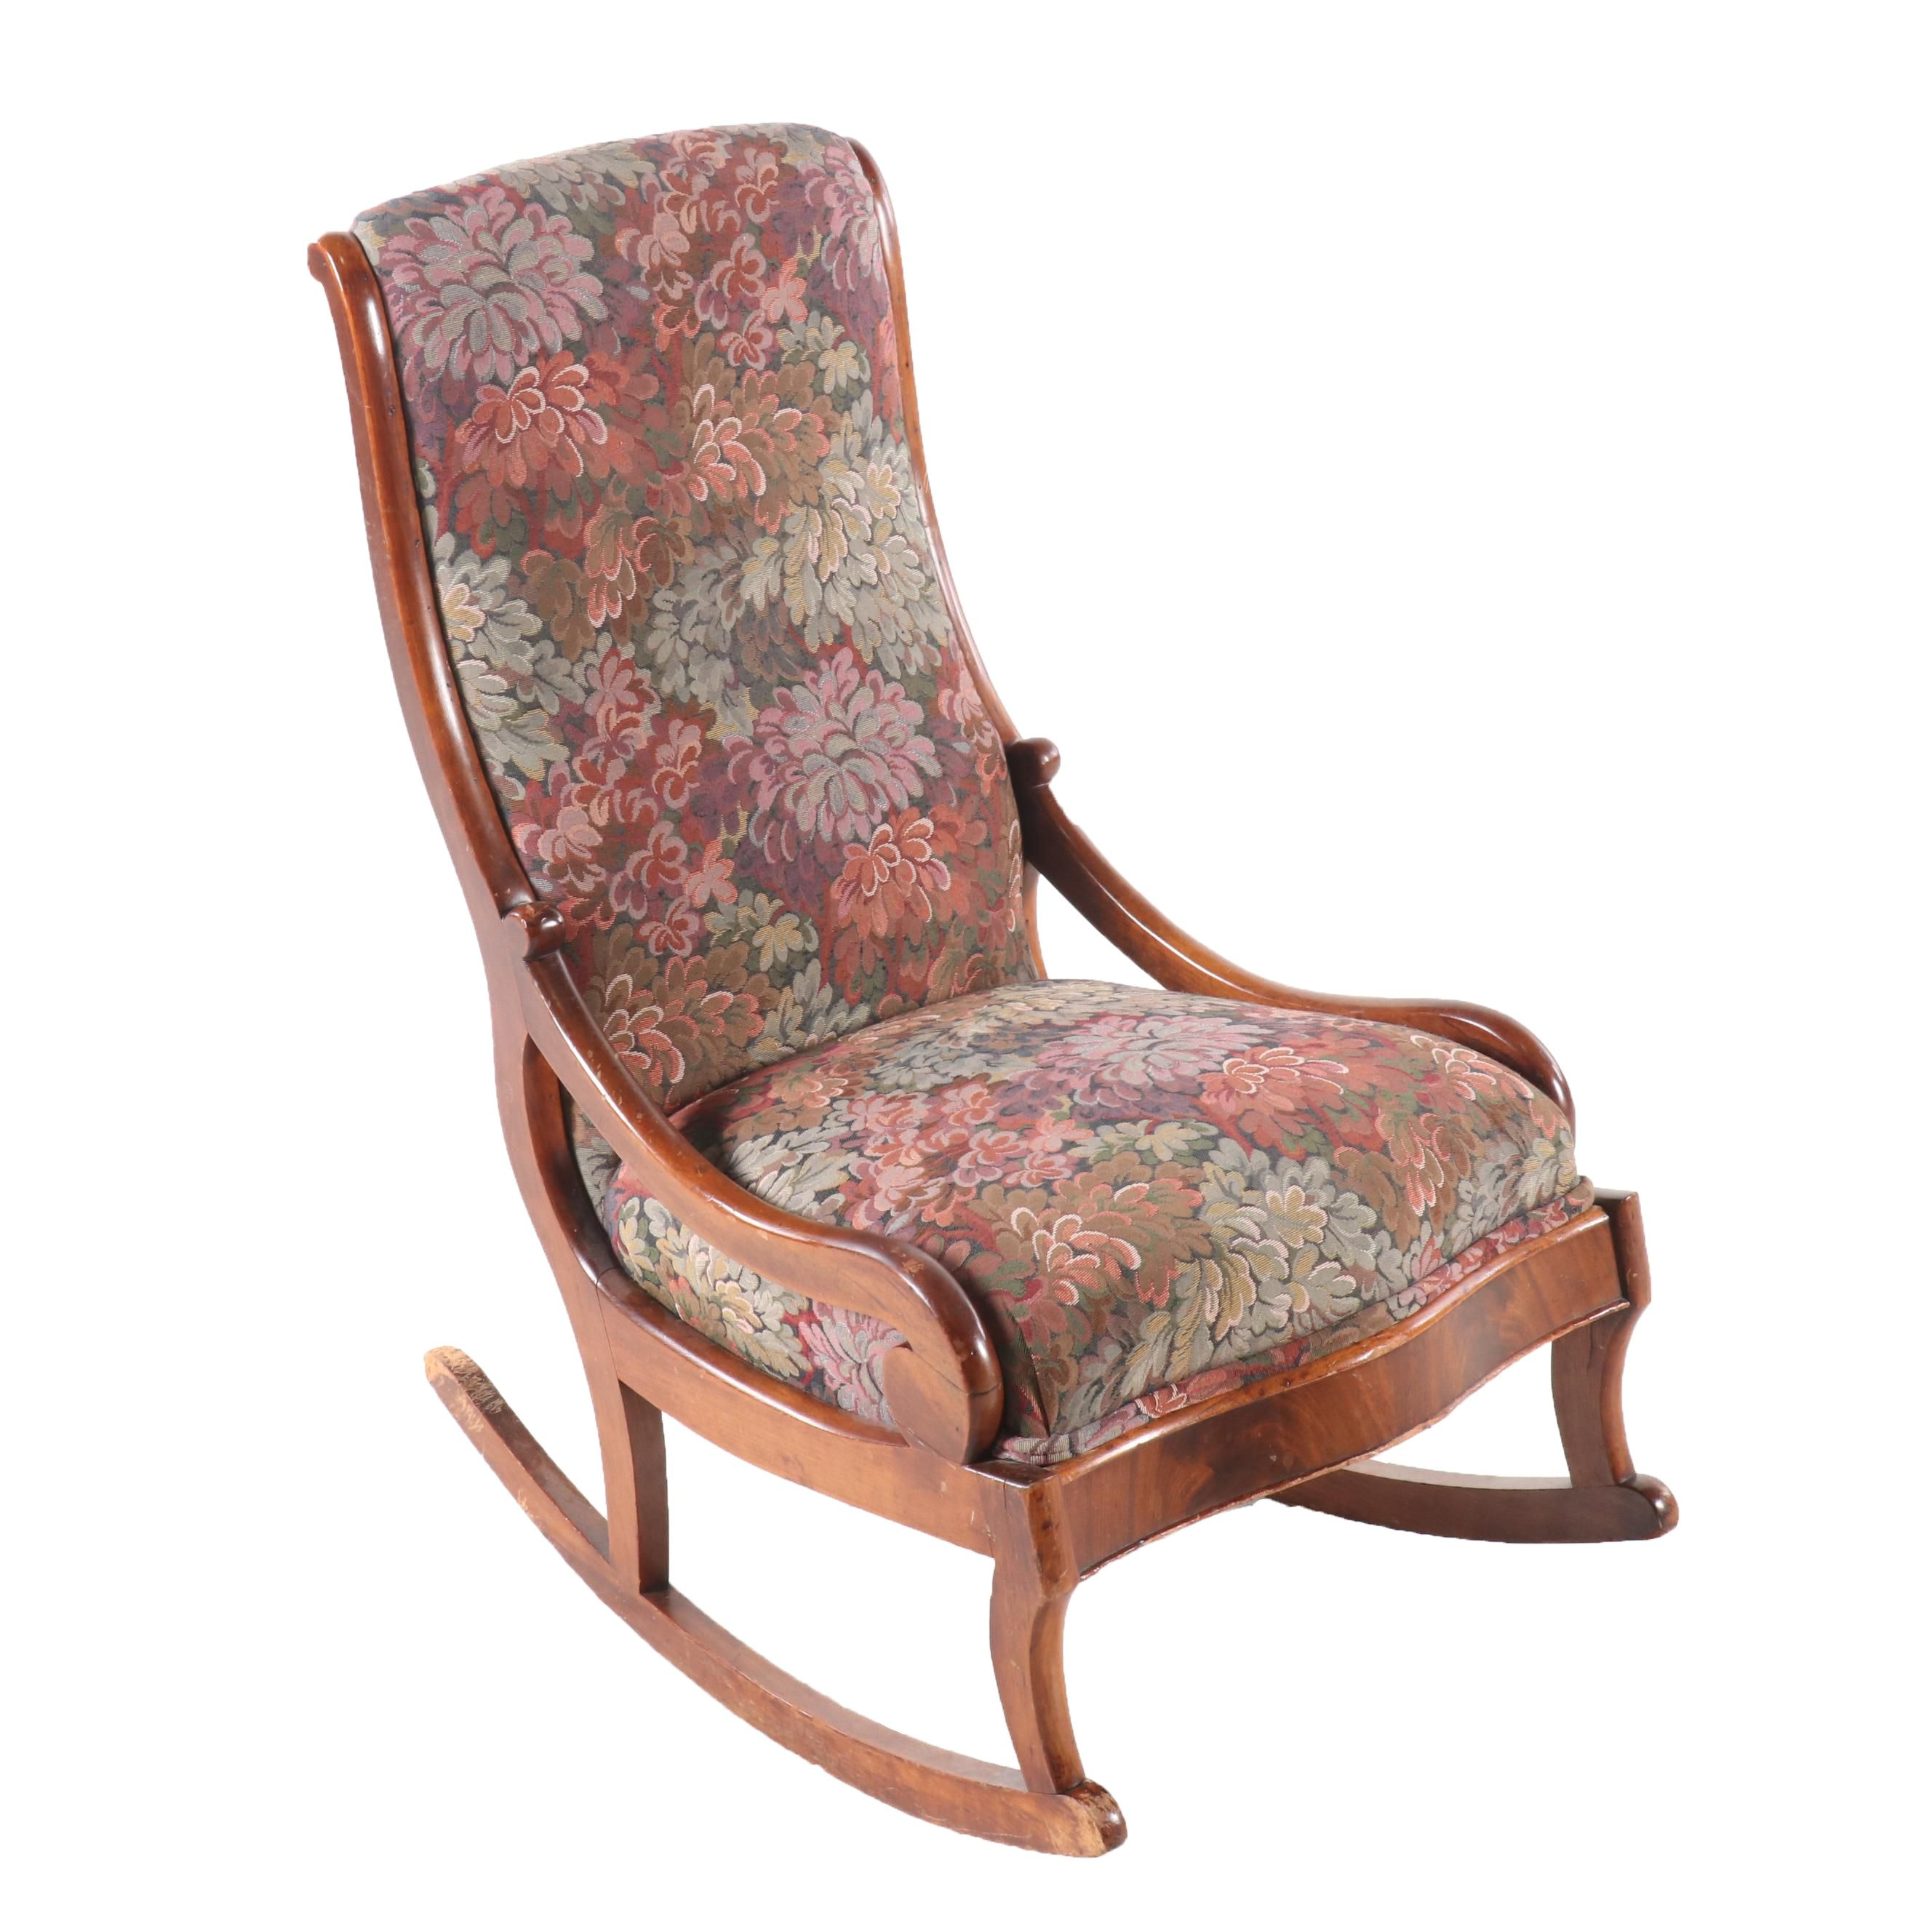 Vintage Tapestry Wood Rocking Chair